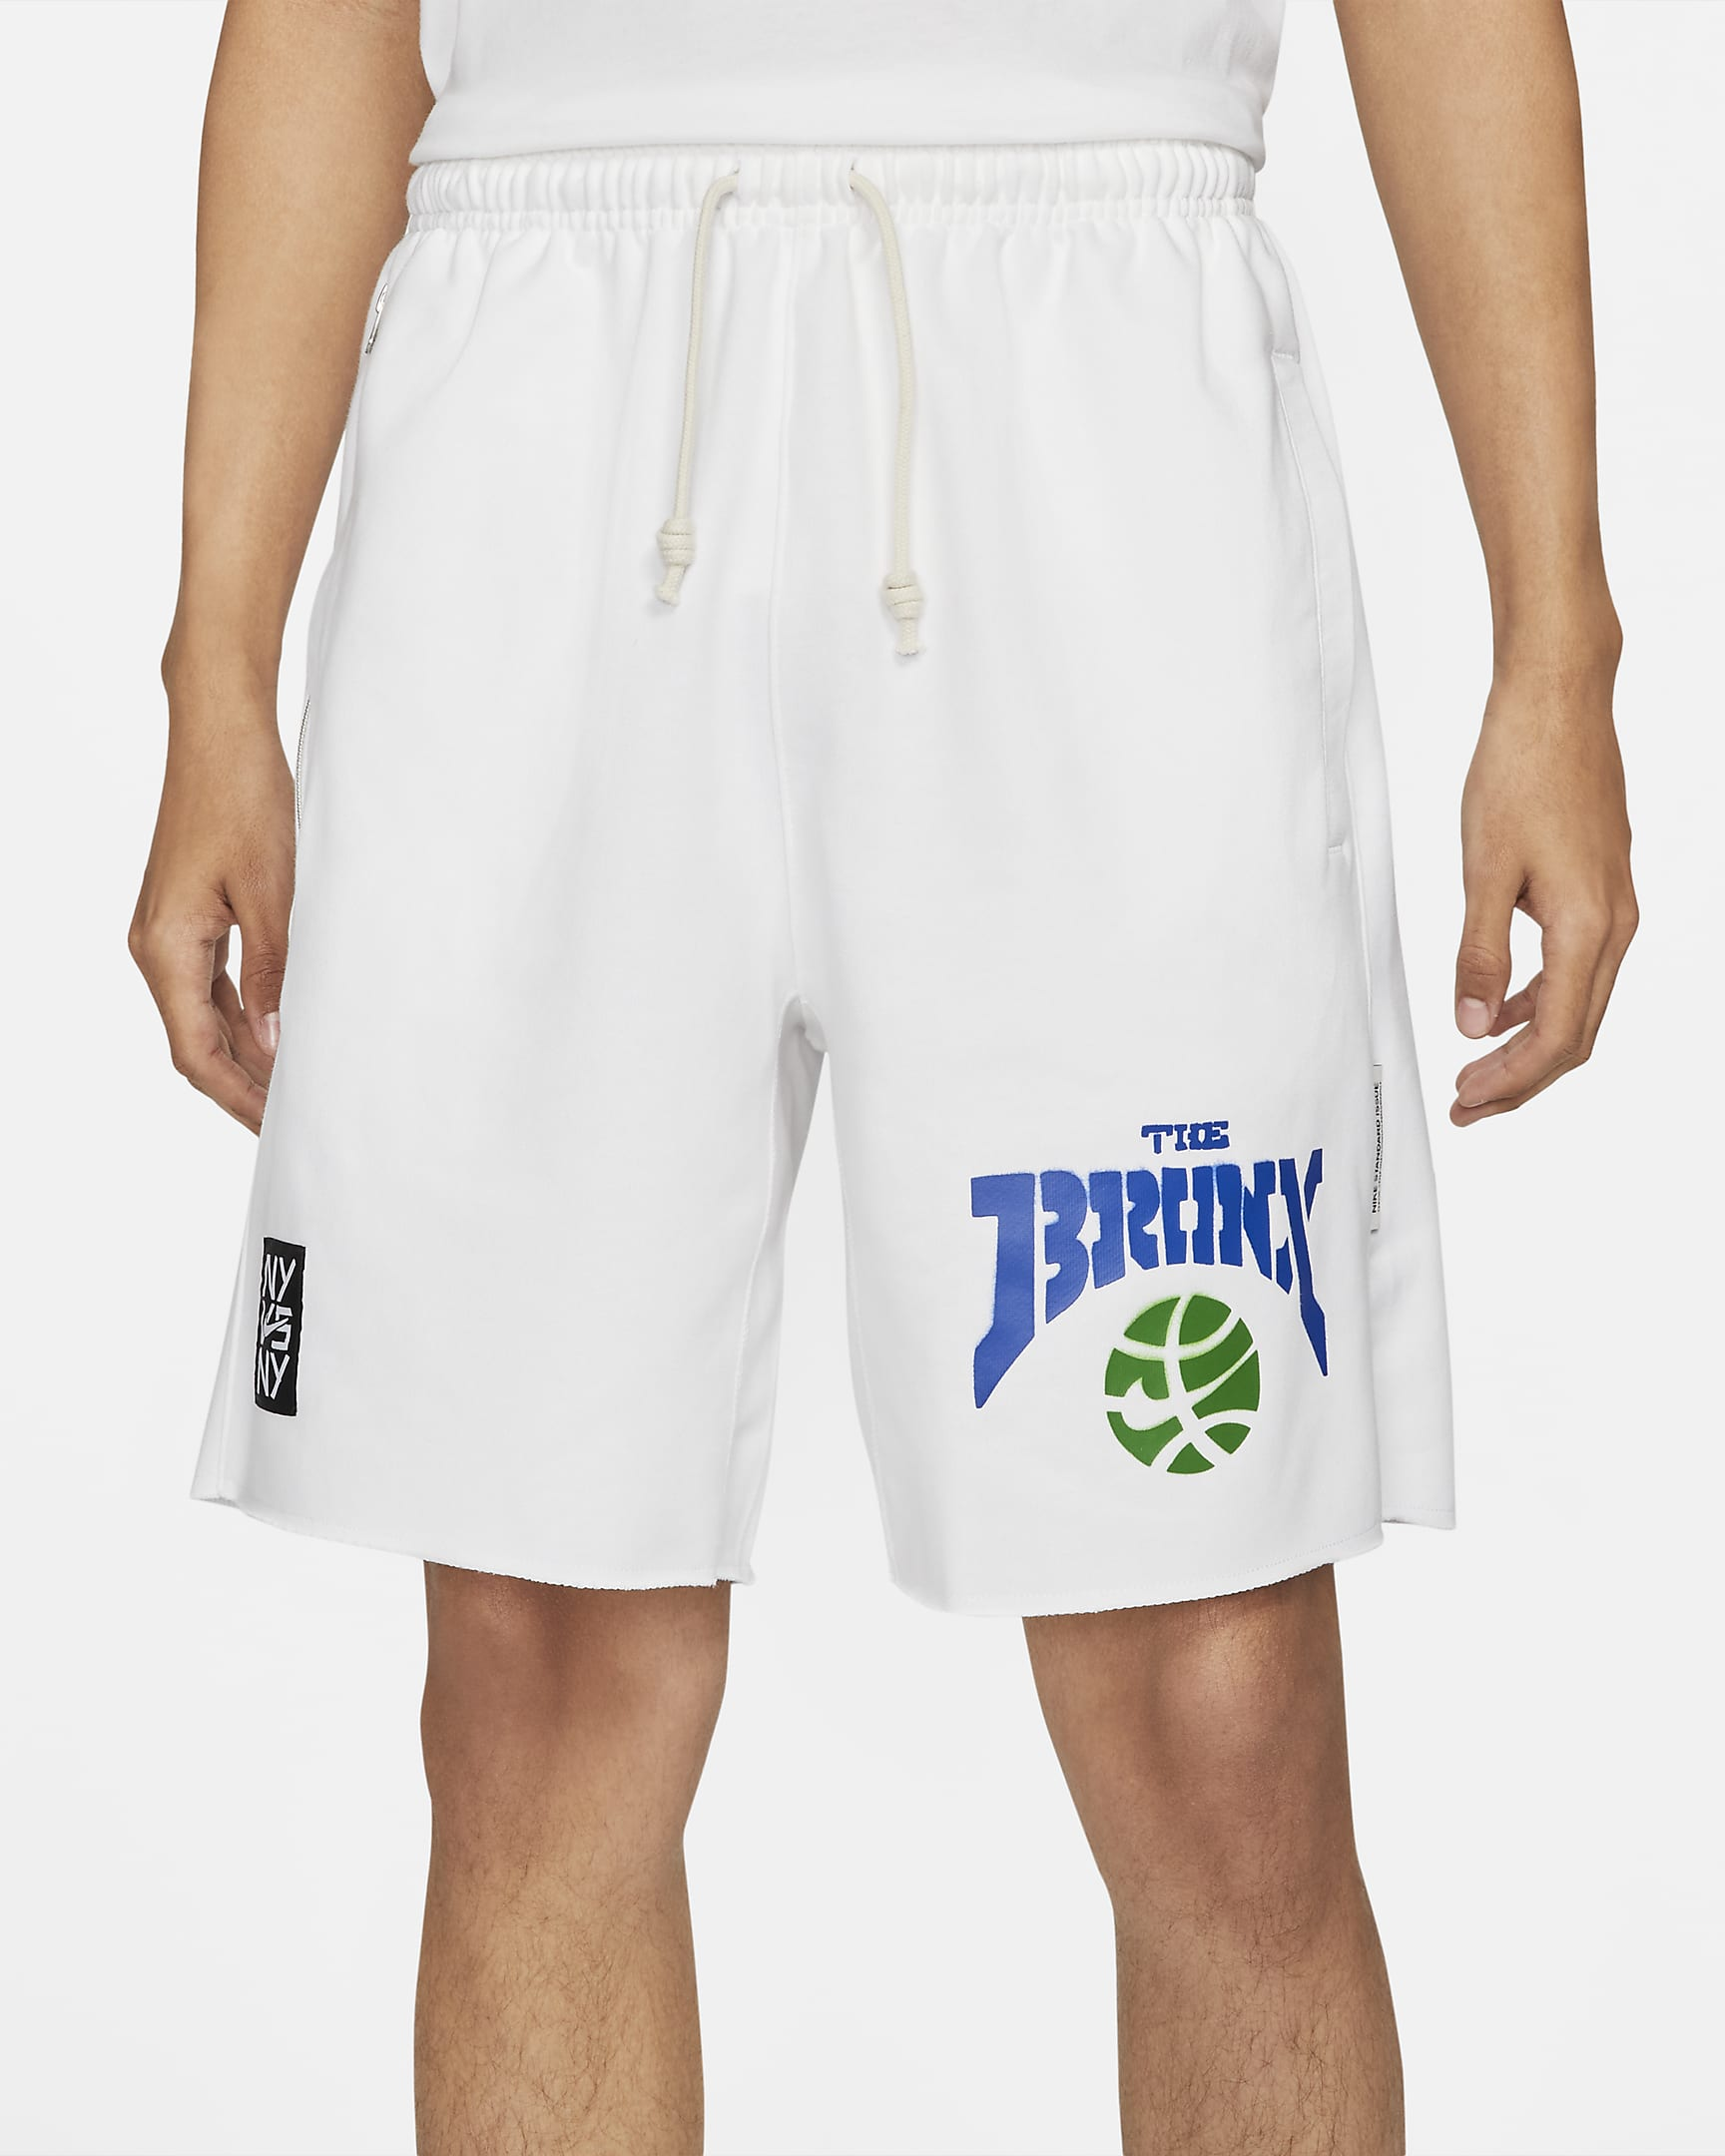 standard-issue-watson-mens-basketball-fleece-shorts-6C2R8v.png